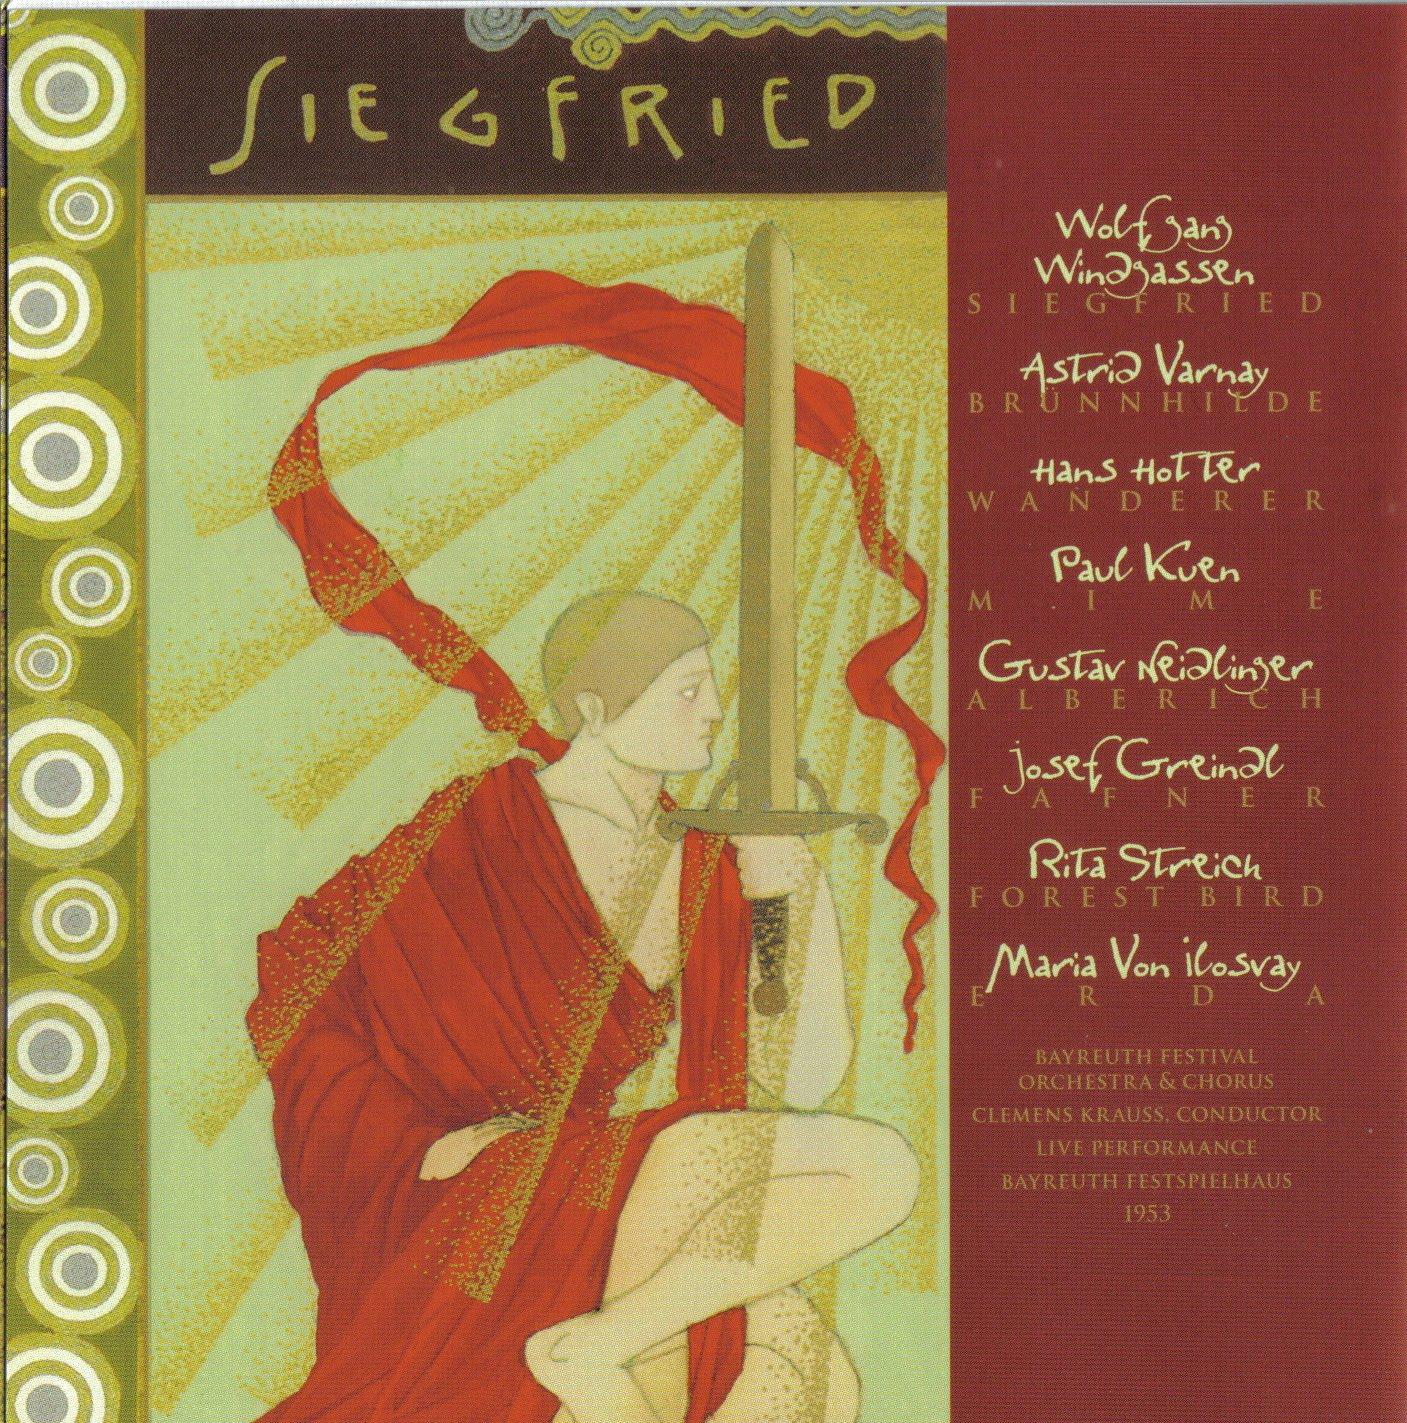 Richard Wagner - Der Ring des Nibelungen (Hans Hotter, Bayreuth 1953) | Siegfried (Sigfrido)